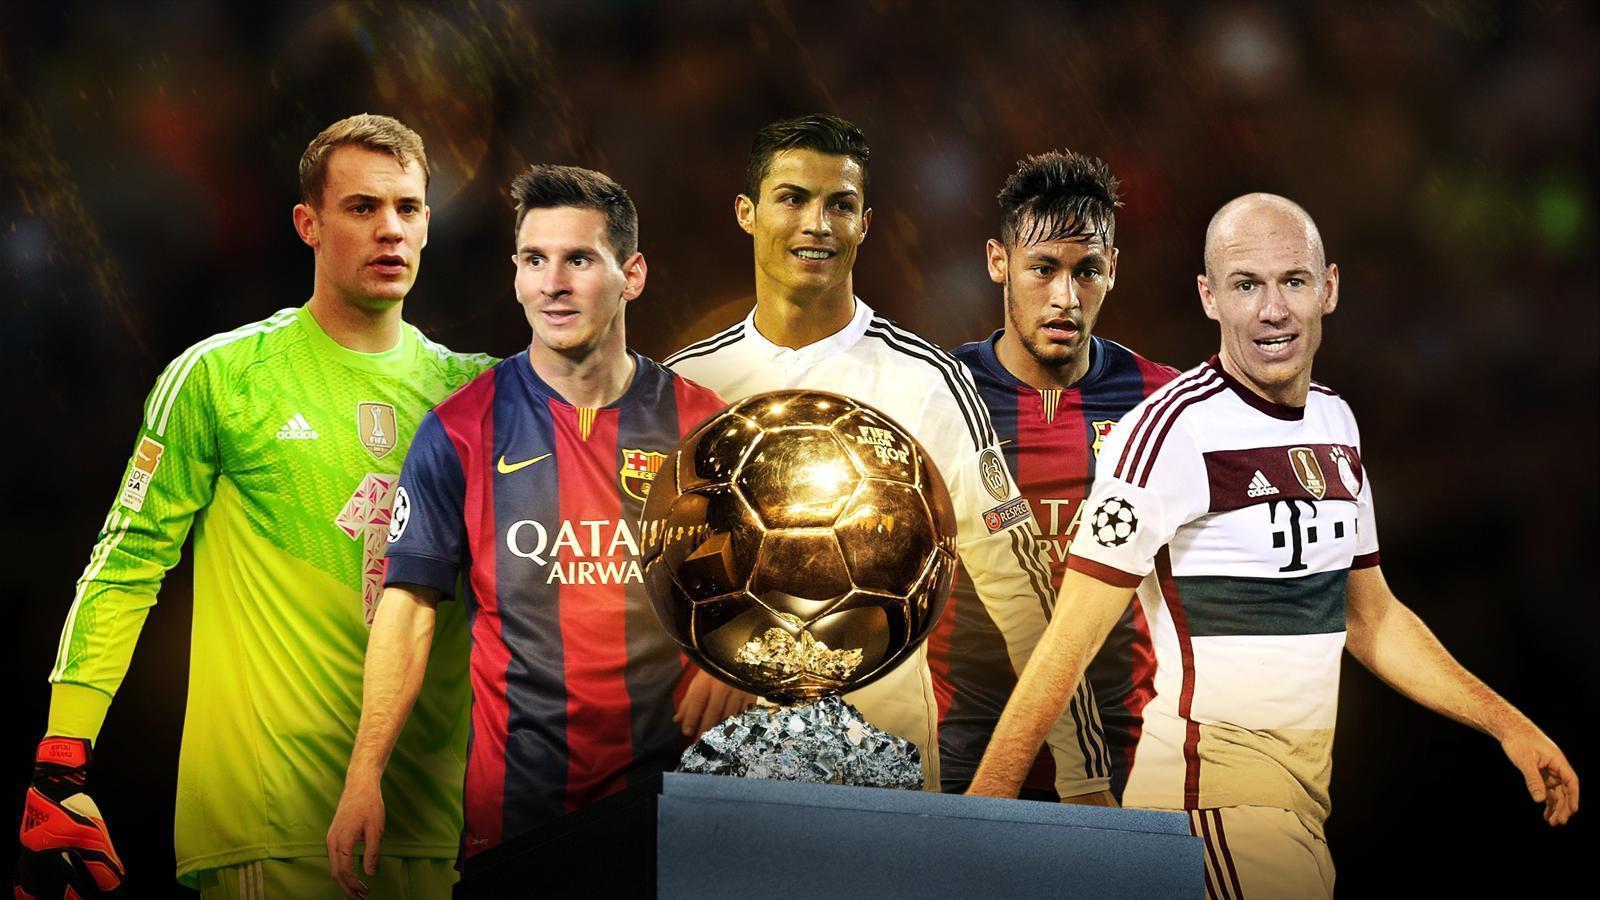 Ronaldo Messi Neymar Wallpaper Hd Football